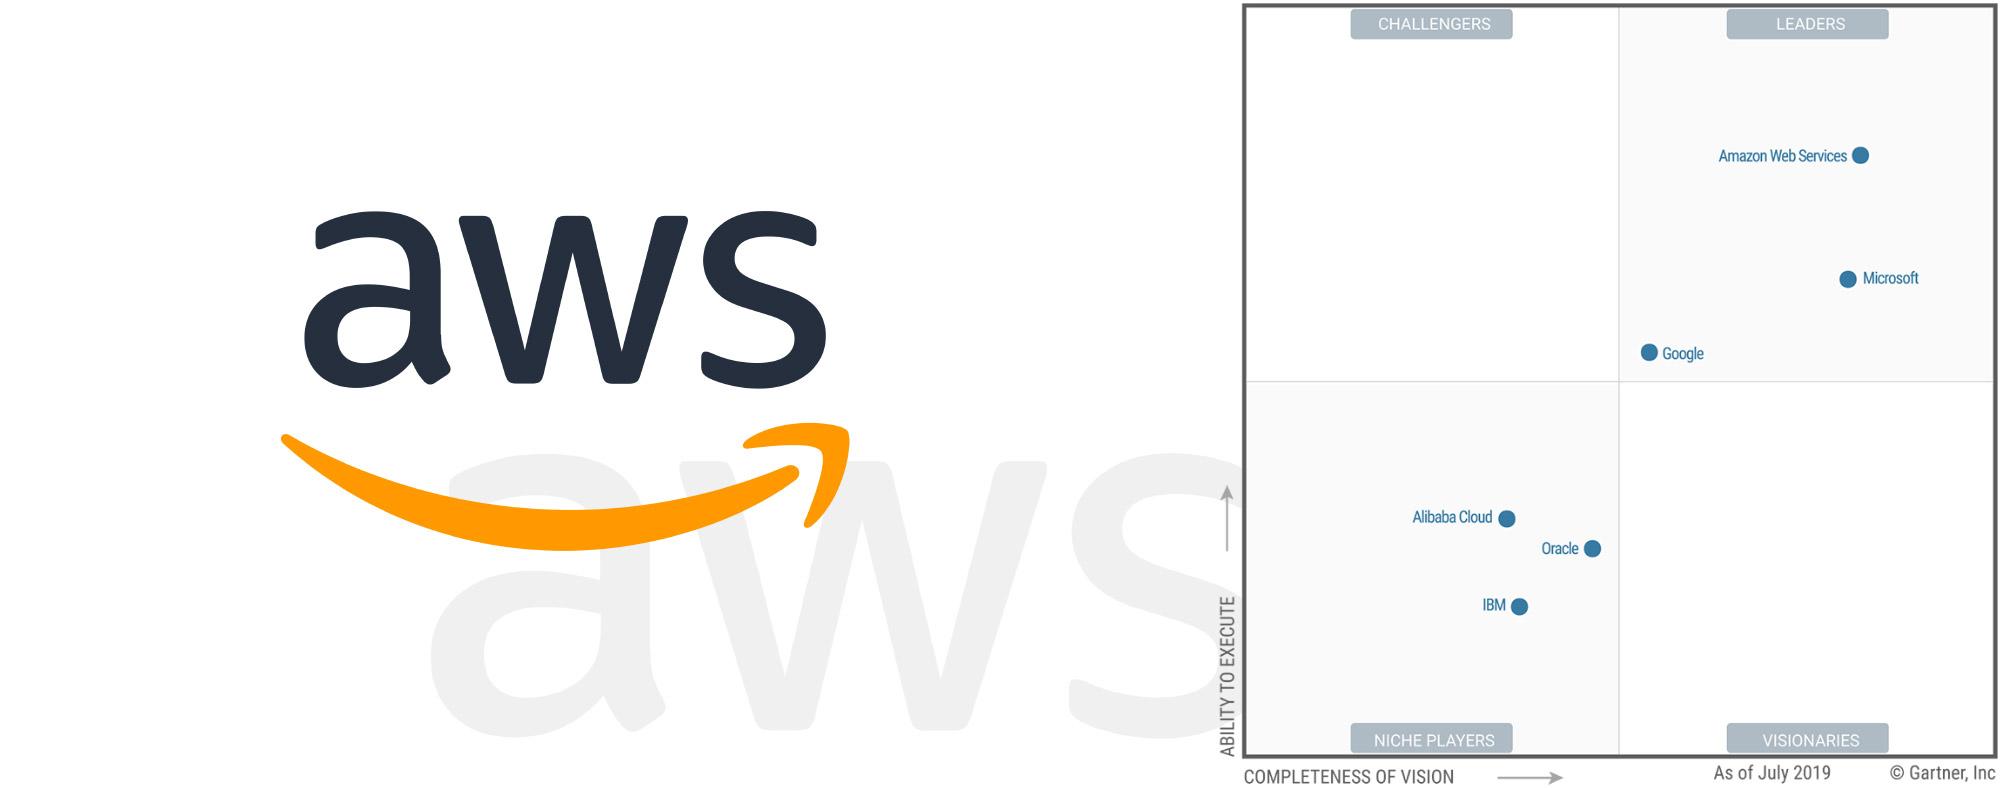 Amazon Web Services - Magic Quadrant by Gartner 2019